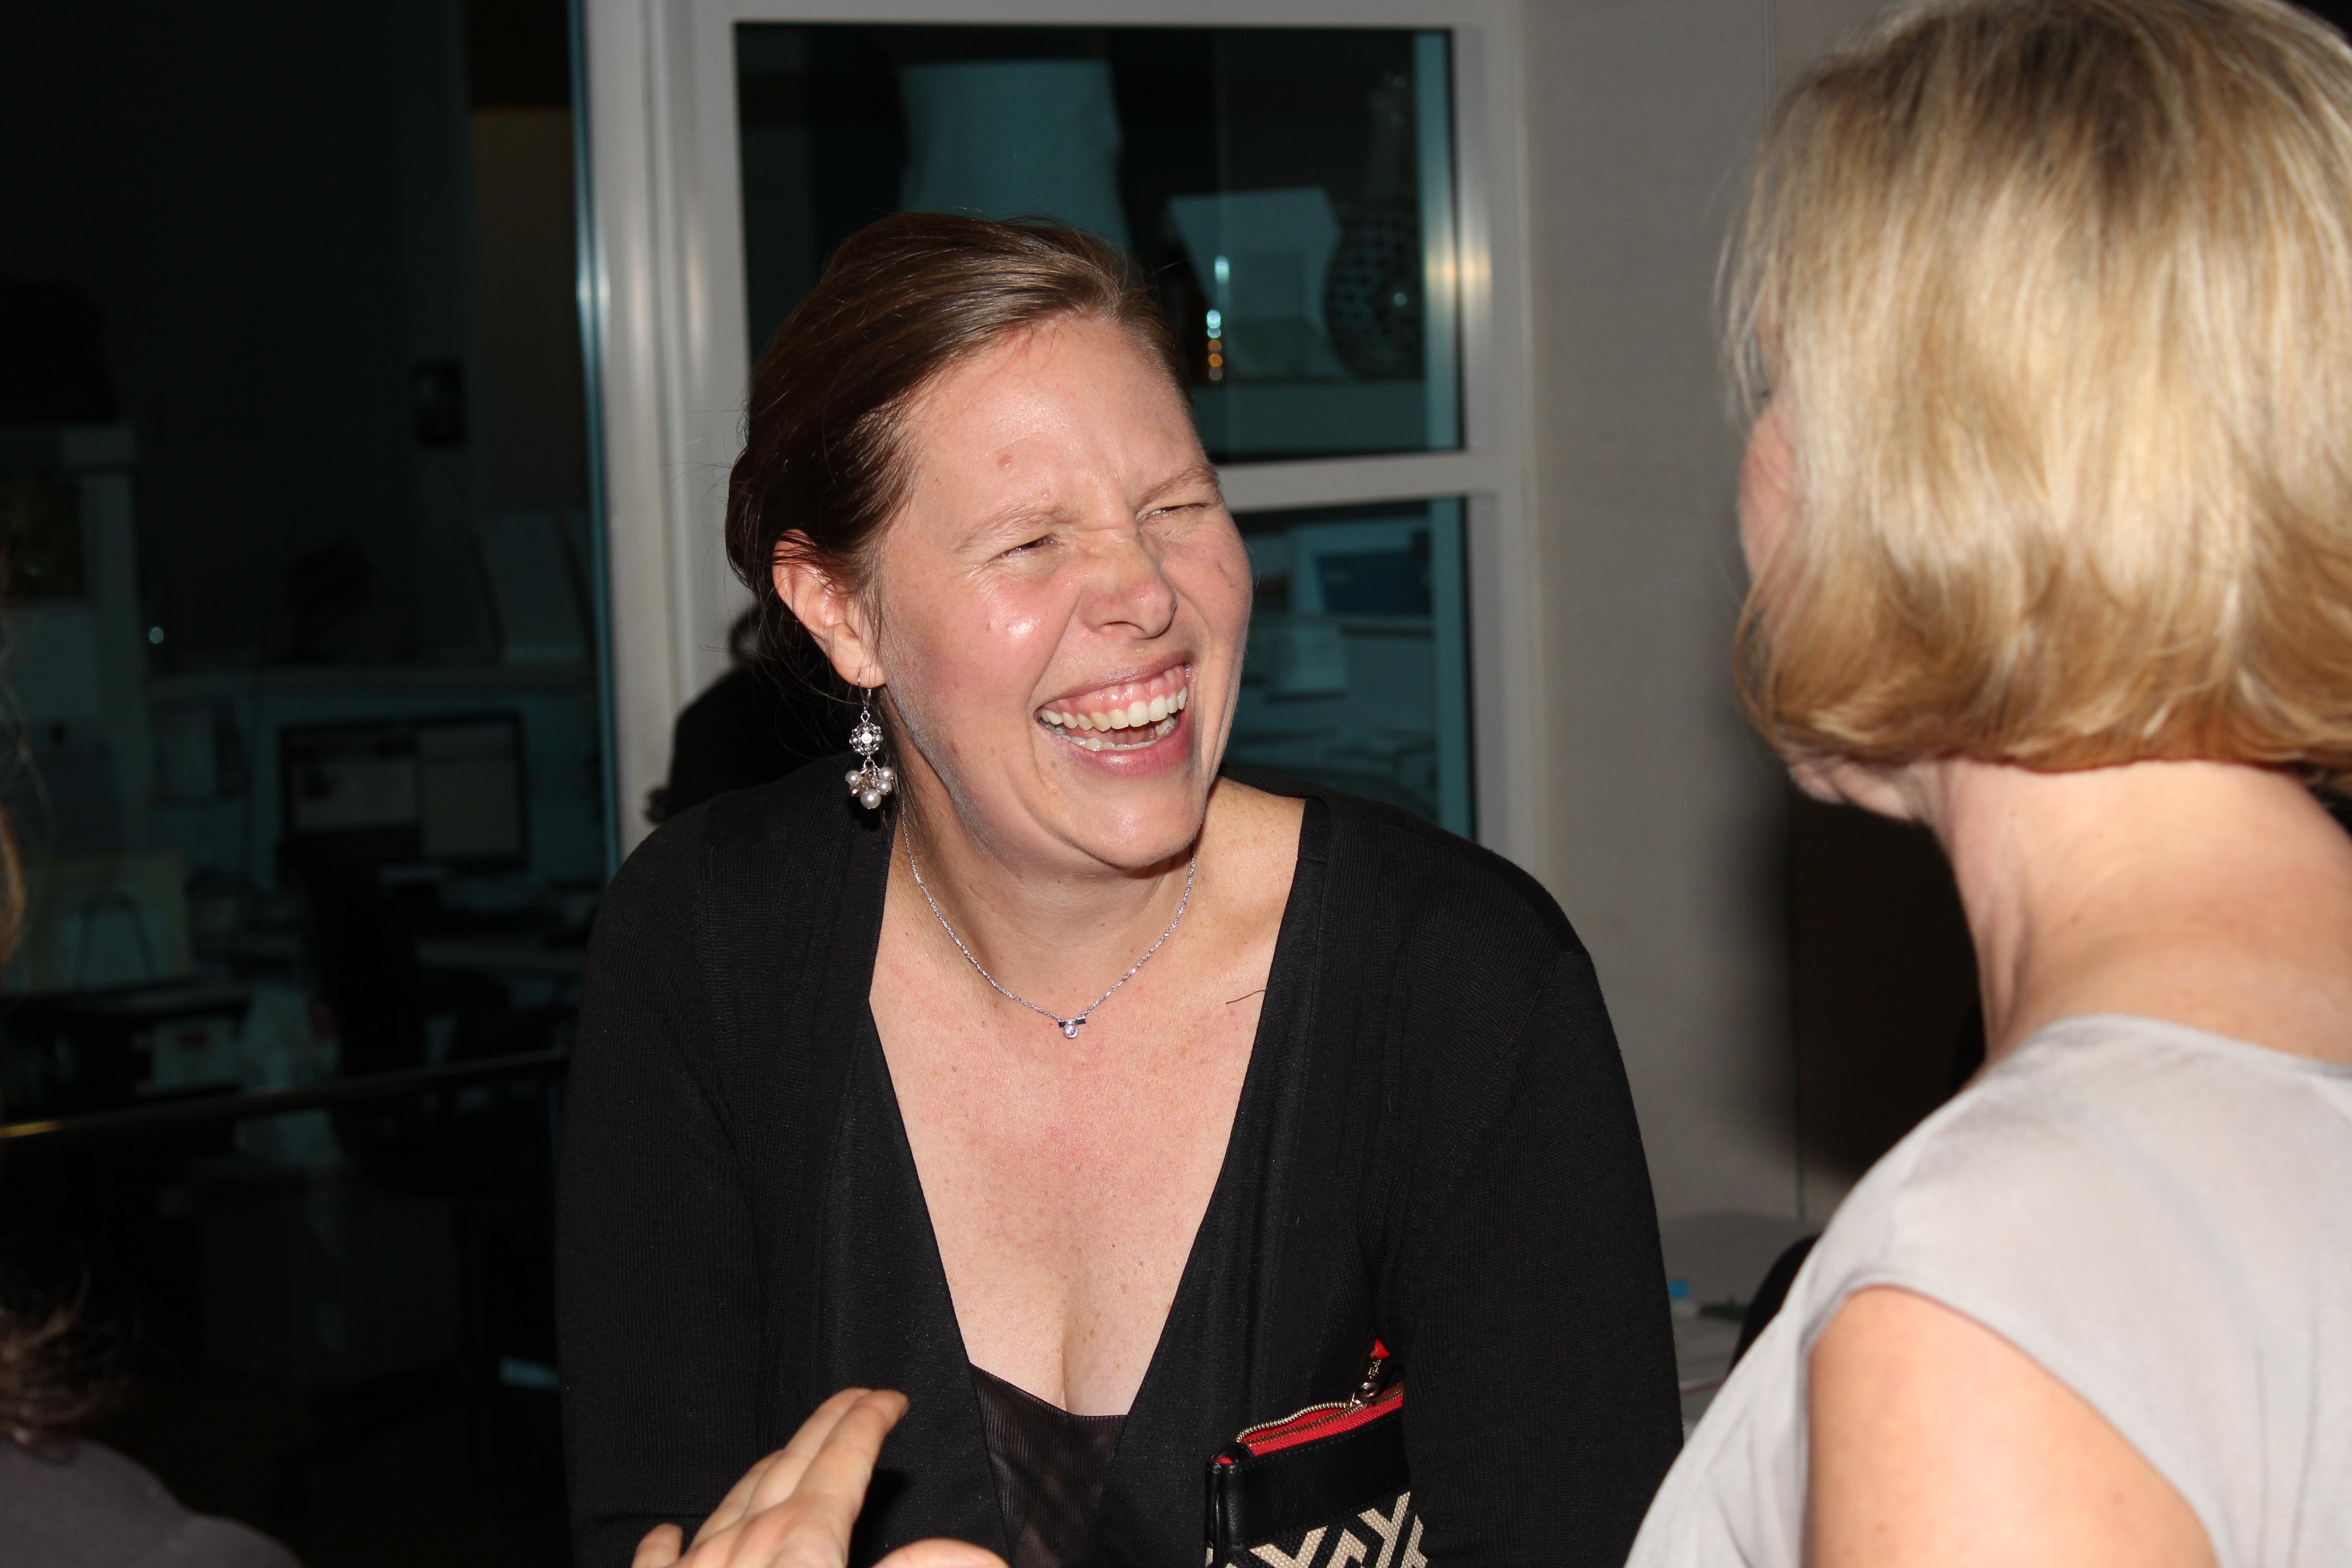 Liz Clasen-KElly and Kirsten Sikkelee